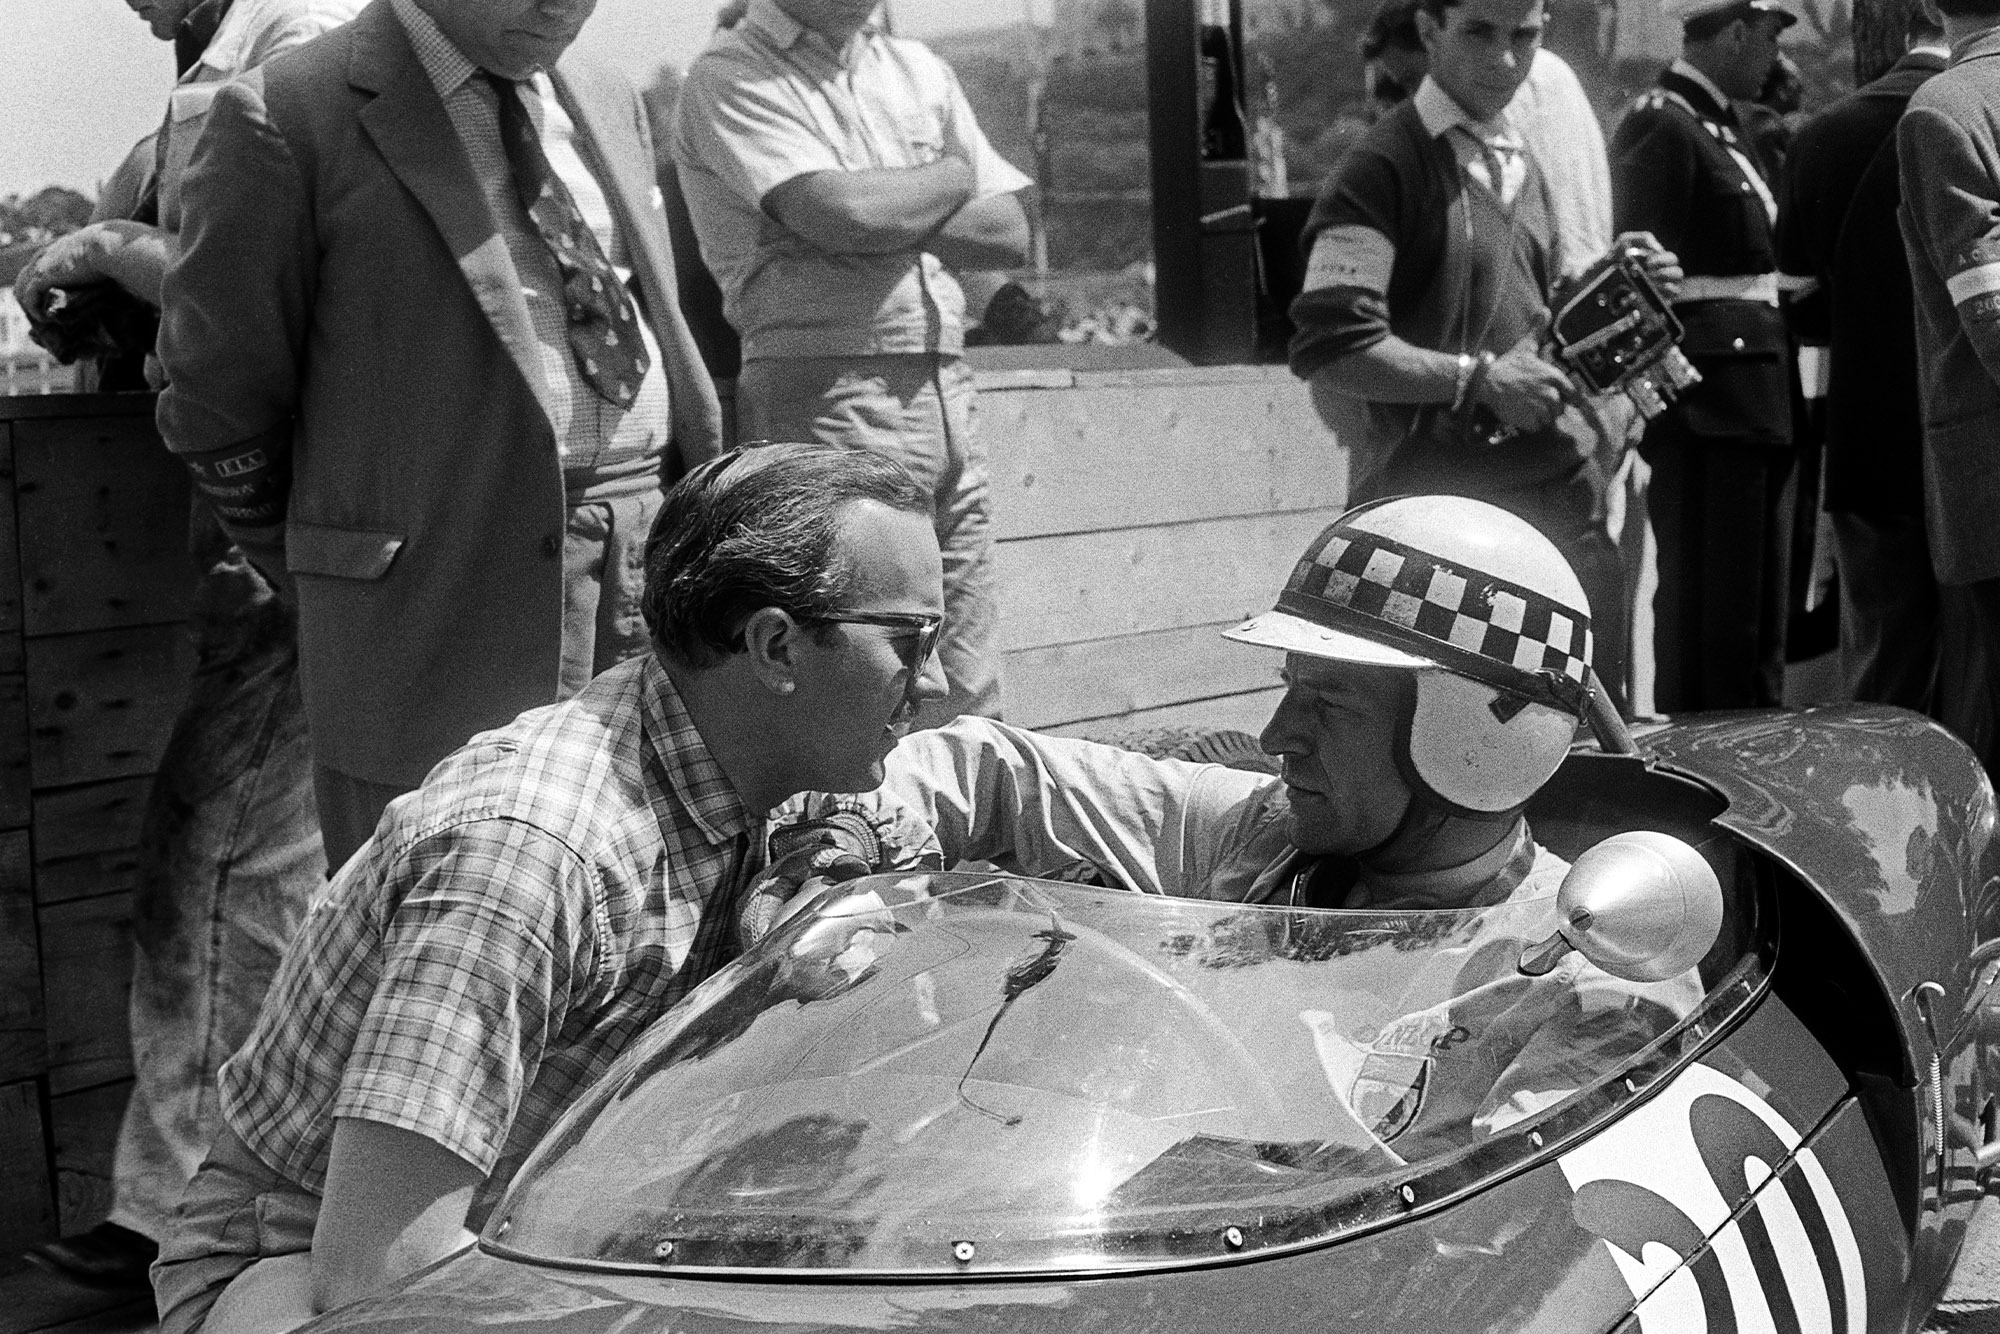 Colin Chapman speaks to Innes Ireland sitting in his Lotus 21 at the 1961 Monaco Grand Prix